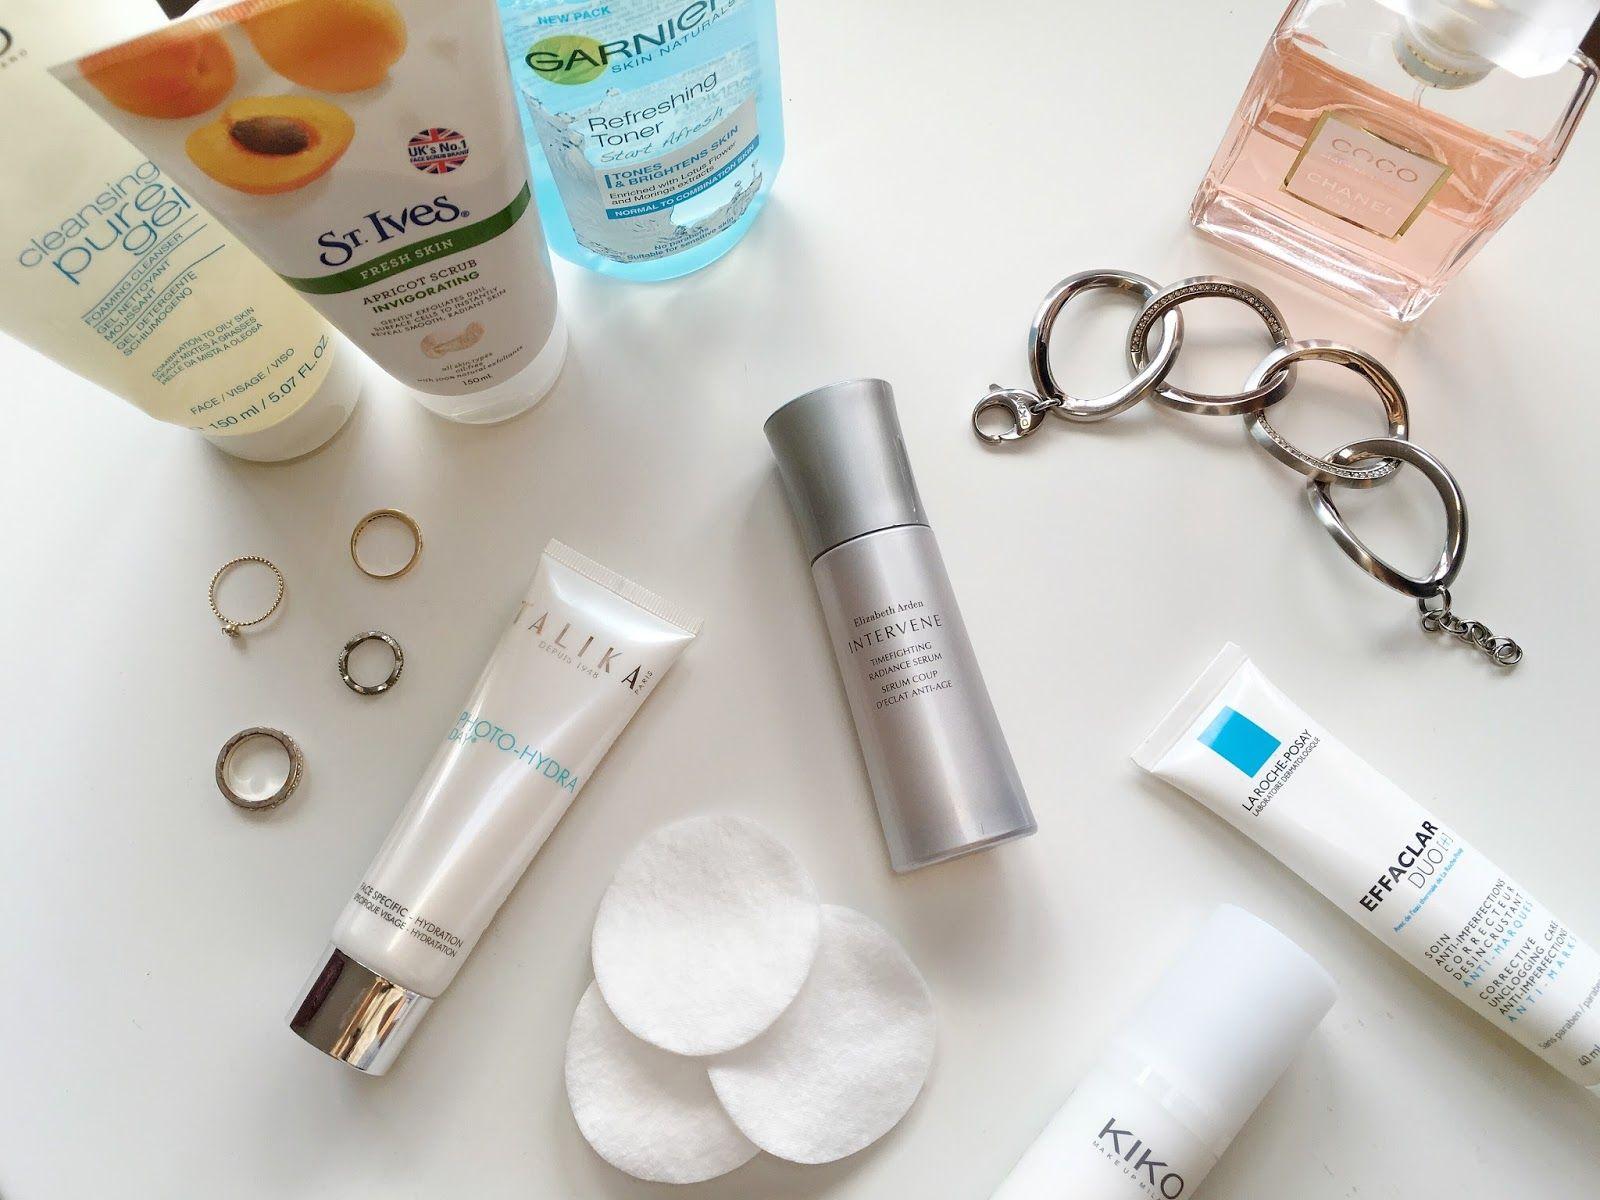 My Current Skincare Routine www.missamyguest.blogspot.co